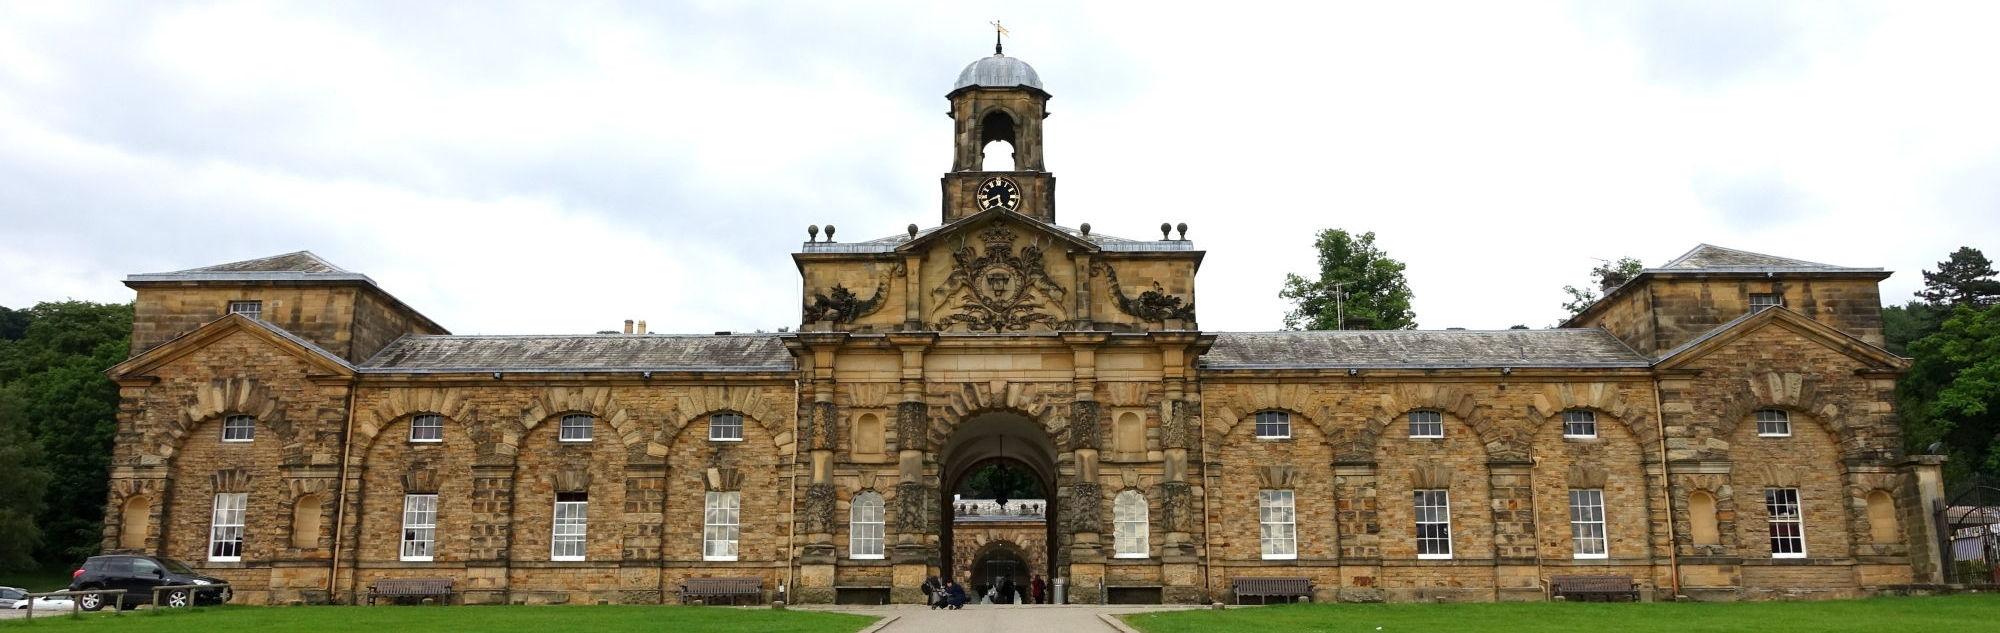 Visit Chatsworth House